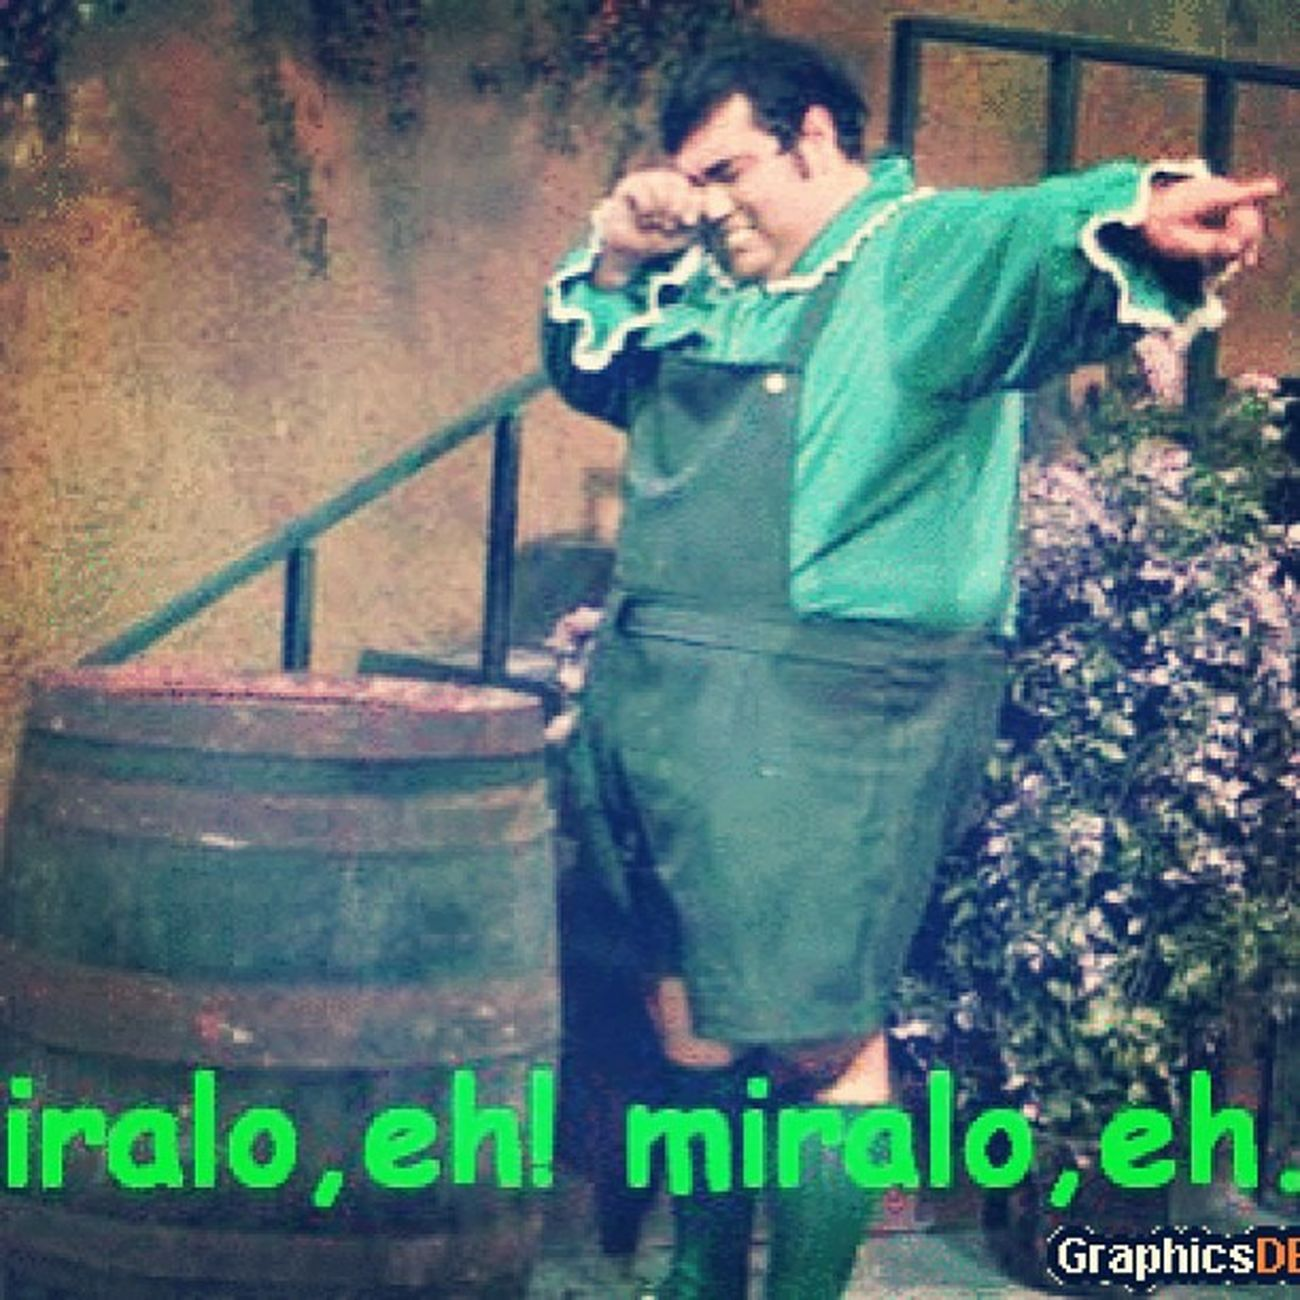 Elchavodelocho True Mexican If  youwatchthislolfunnyshitlol Miralo eh miralo eh miralo eh HAHAhHa :p